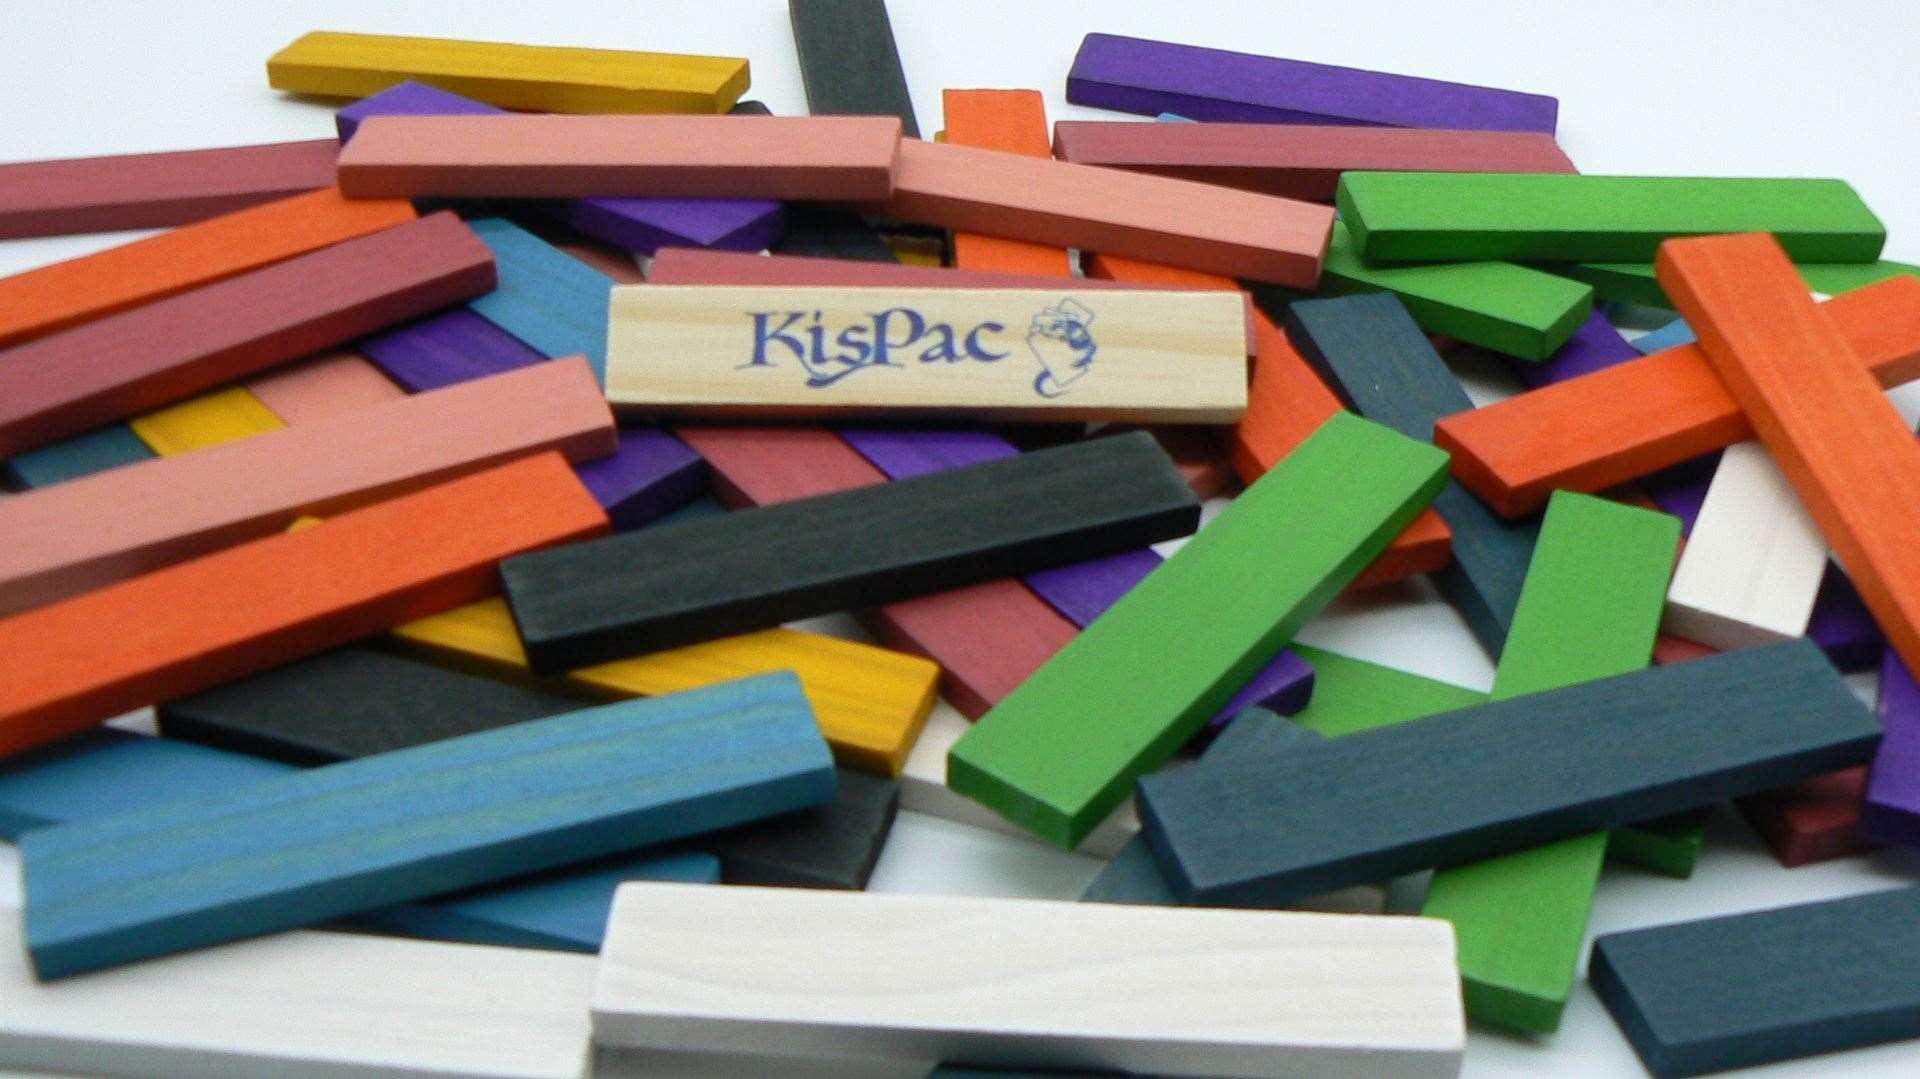 kispac la planchette en bois kispac planchettes de jeu en bois 200